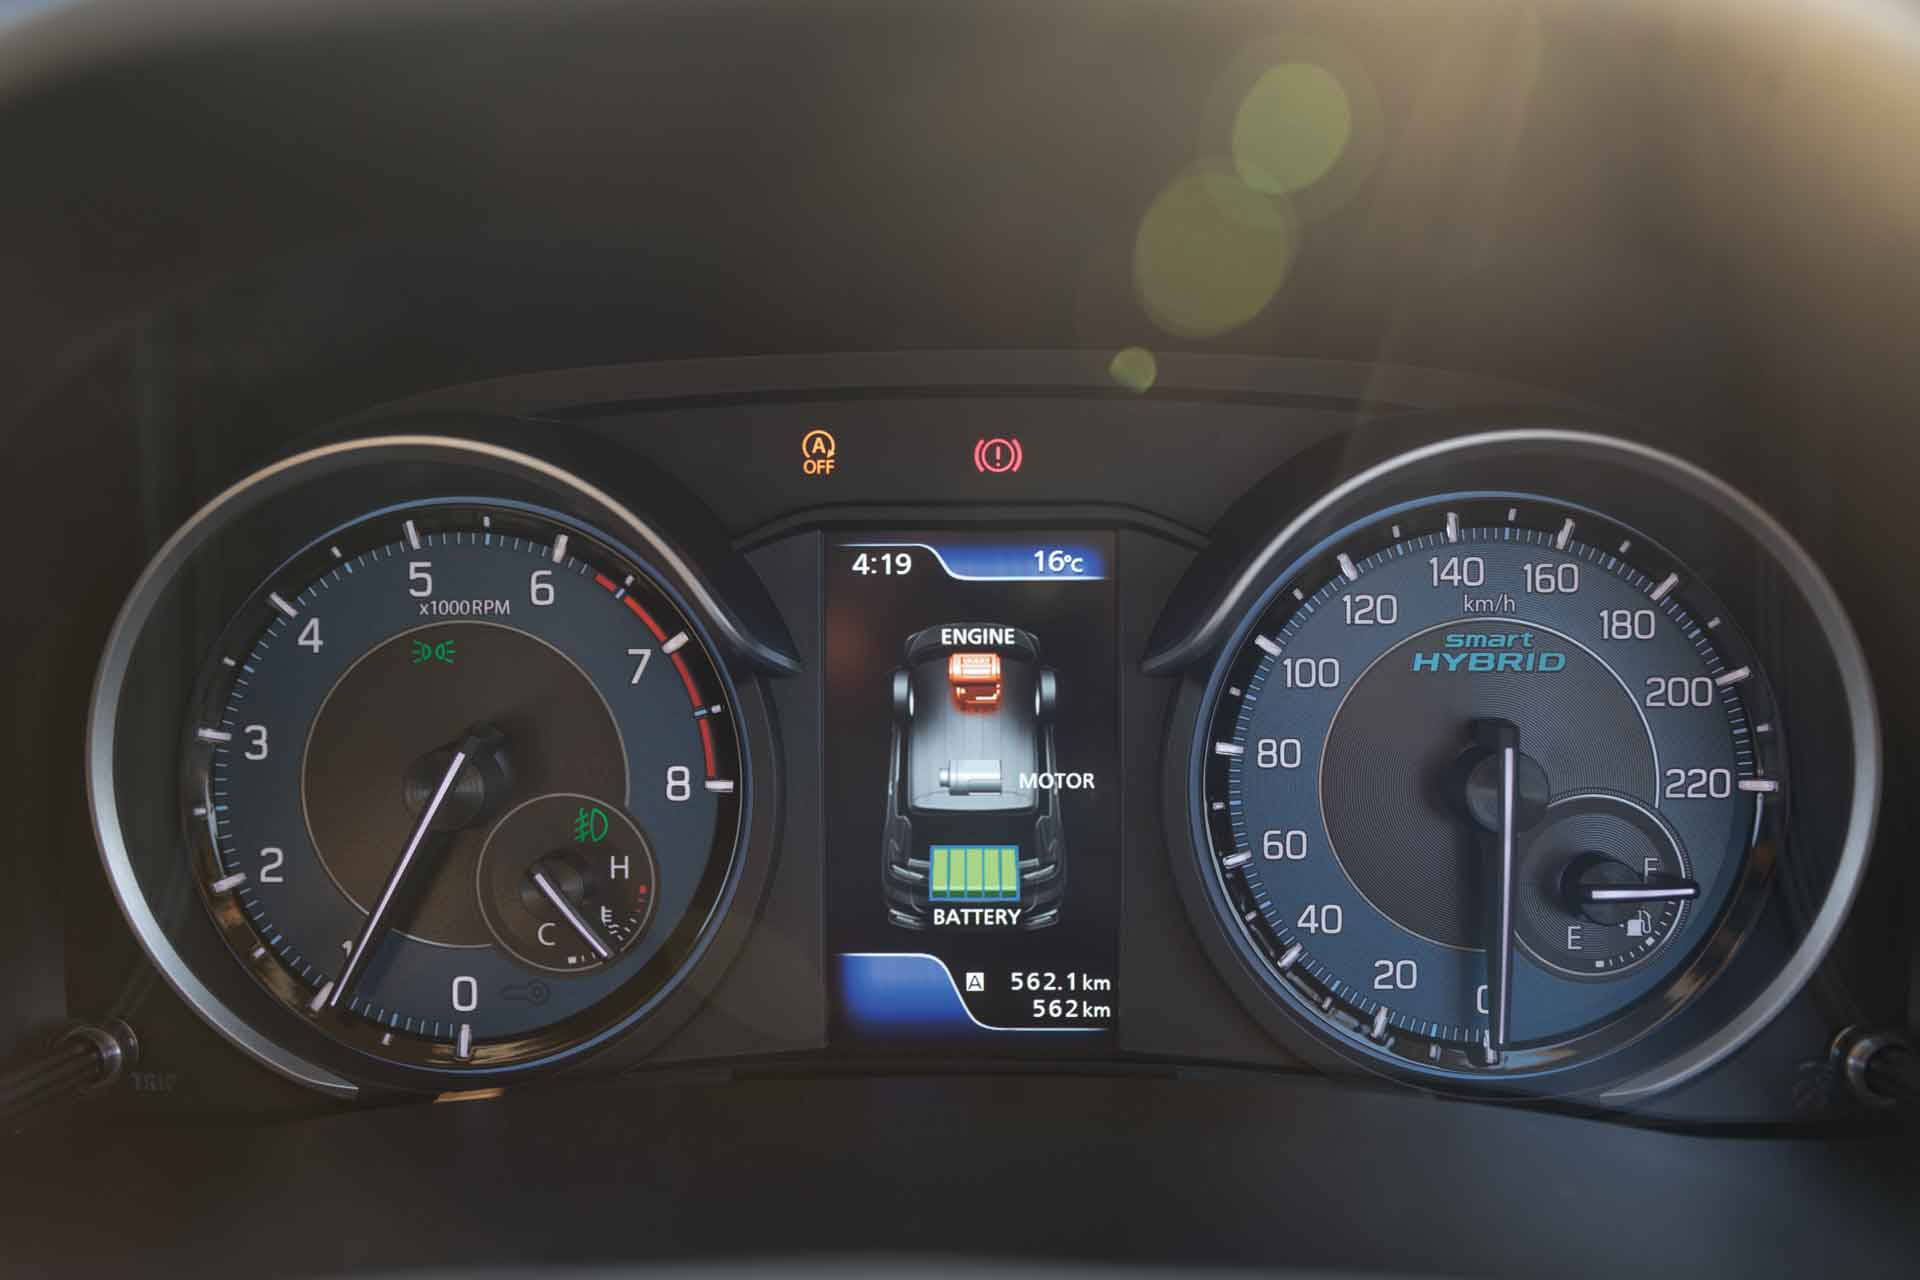 Maruti Suzuki Ertiga Hybrid